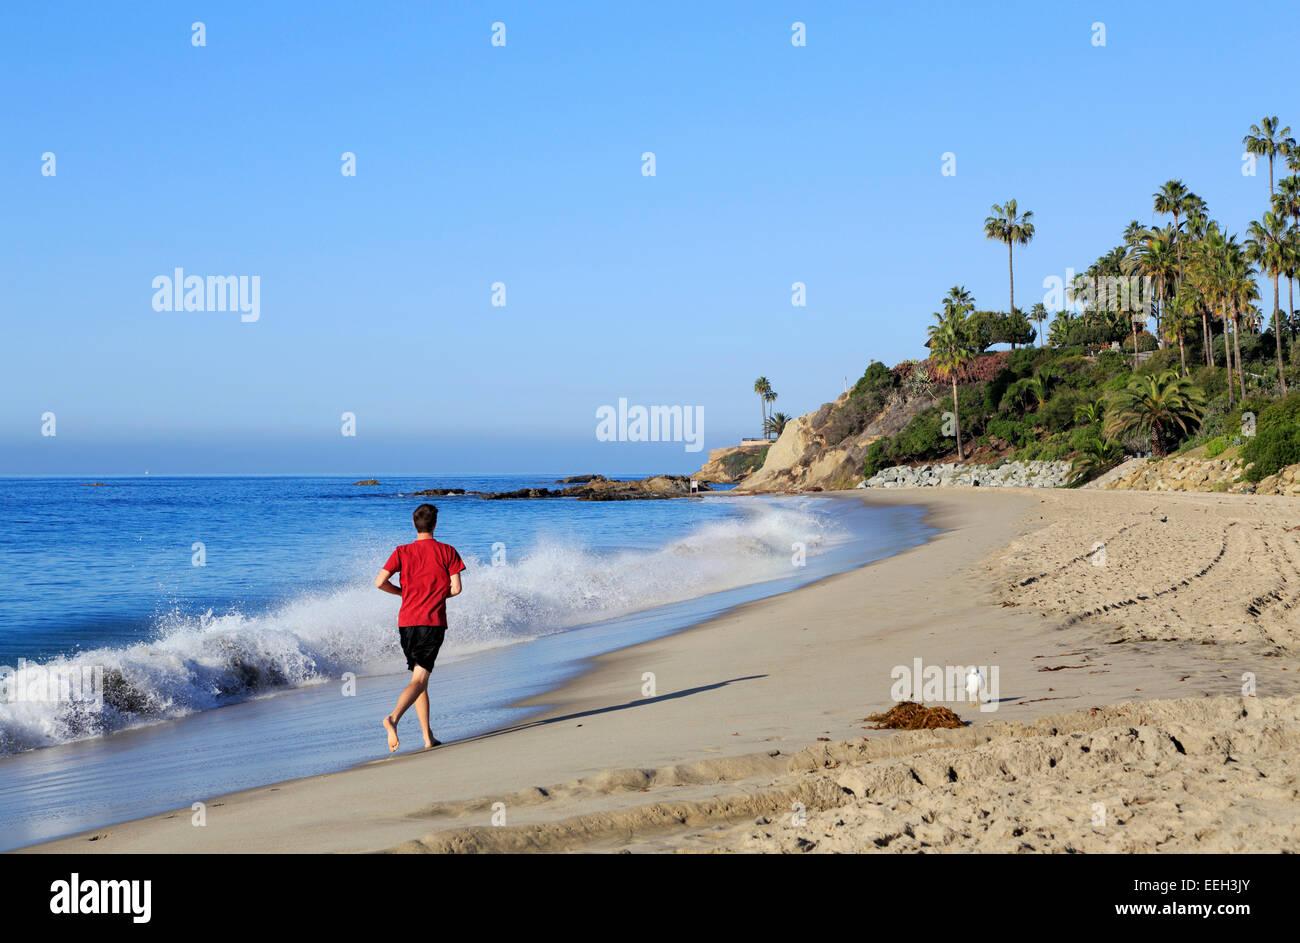 laguna-beach-orange-county-california-man-running-on-the-beach-EEH3JY.jpg